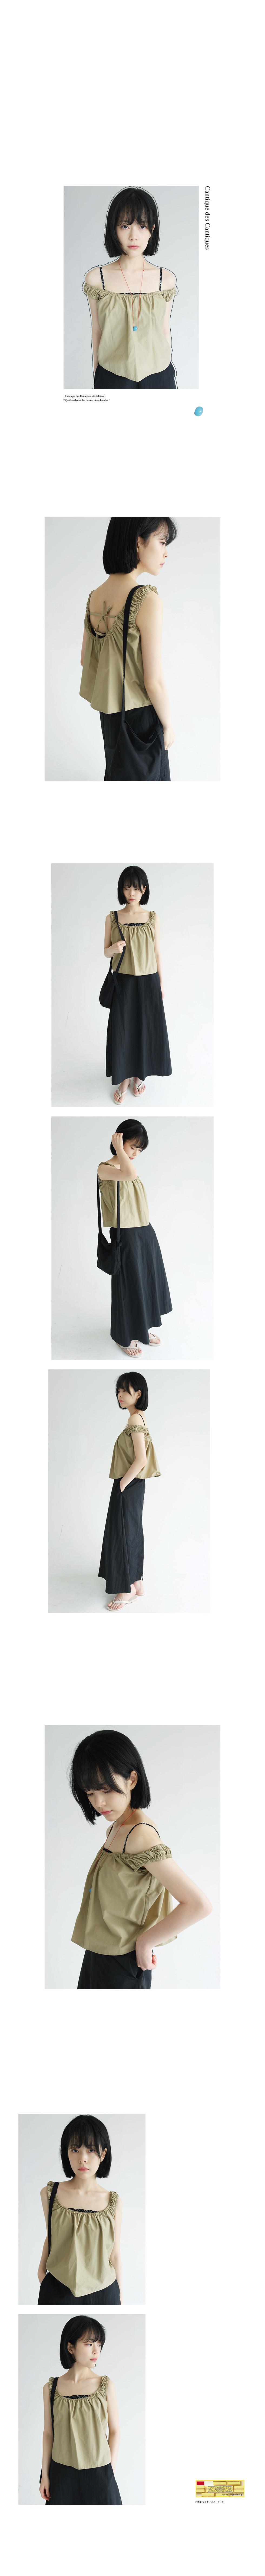 matt texture crispy skirts